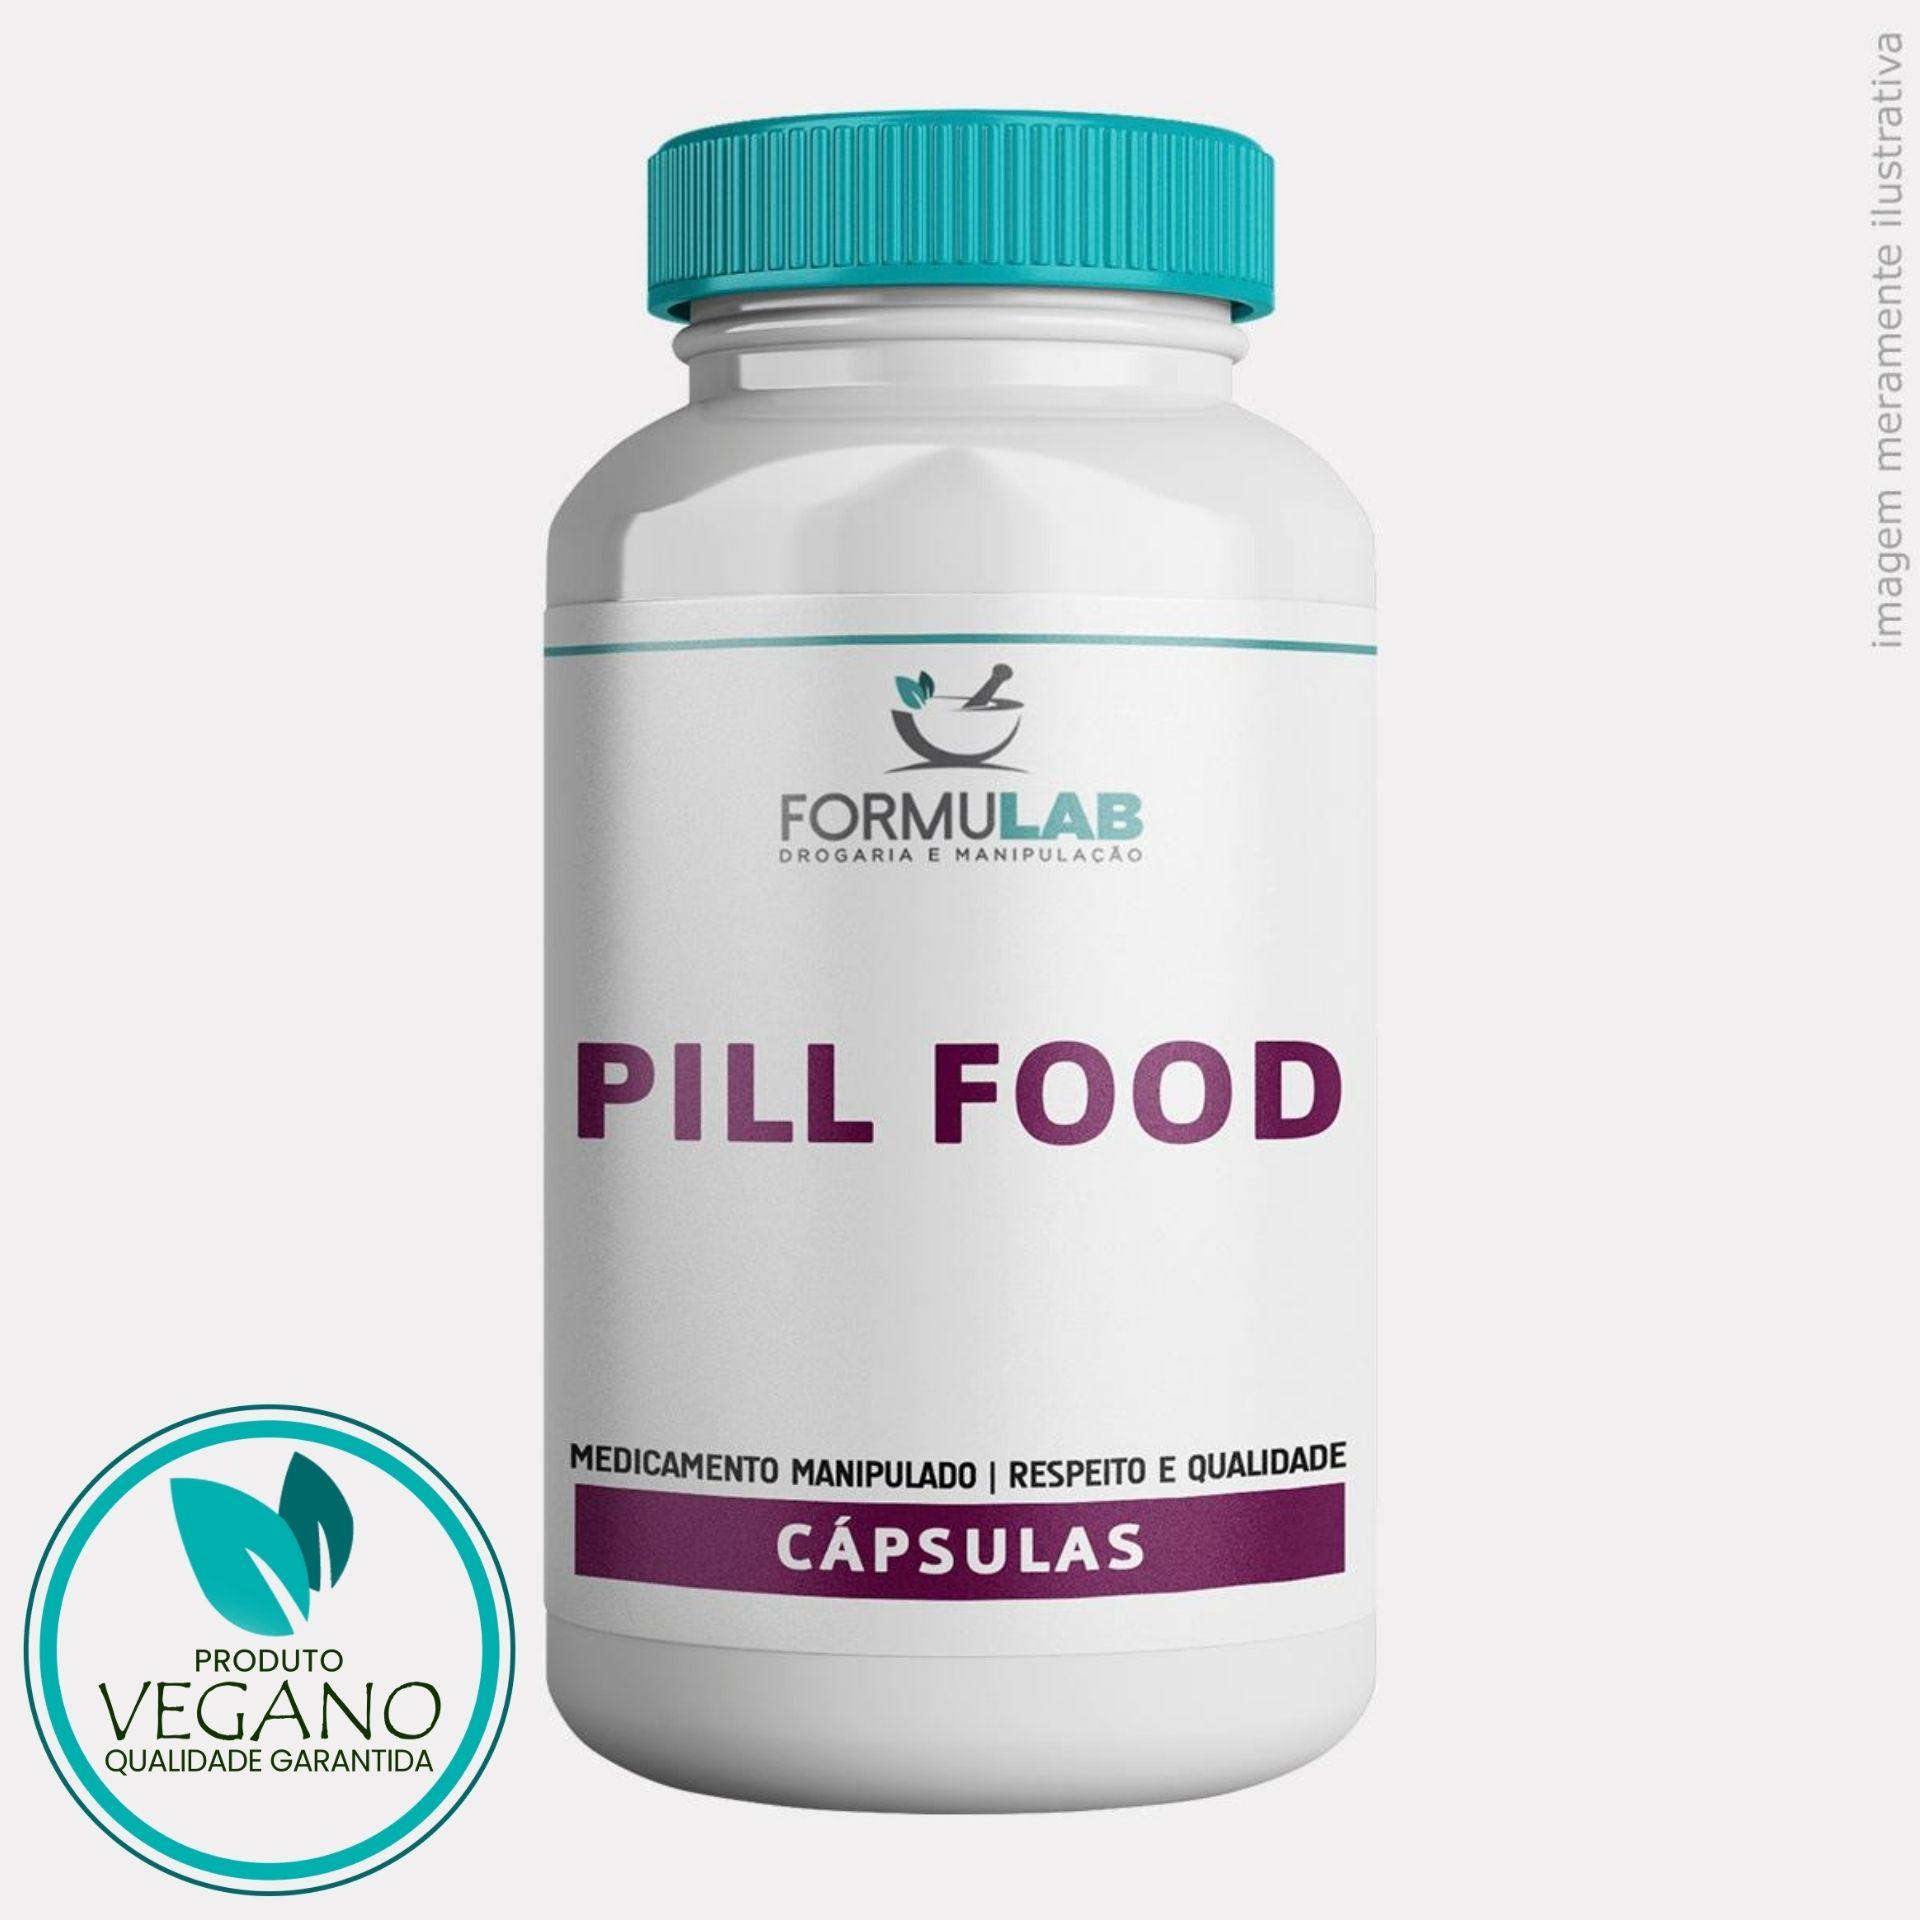 Pill Food VEGAN - Biotina + Cisteína + Cistina + Metionina + Pantotenato de Cálcio + Vitamina B2 + Vitamina B6 + Vitamina E